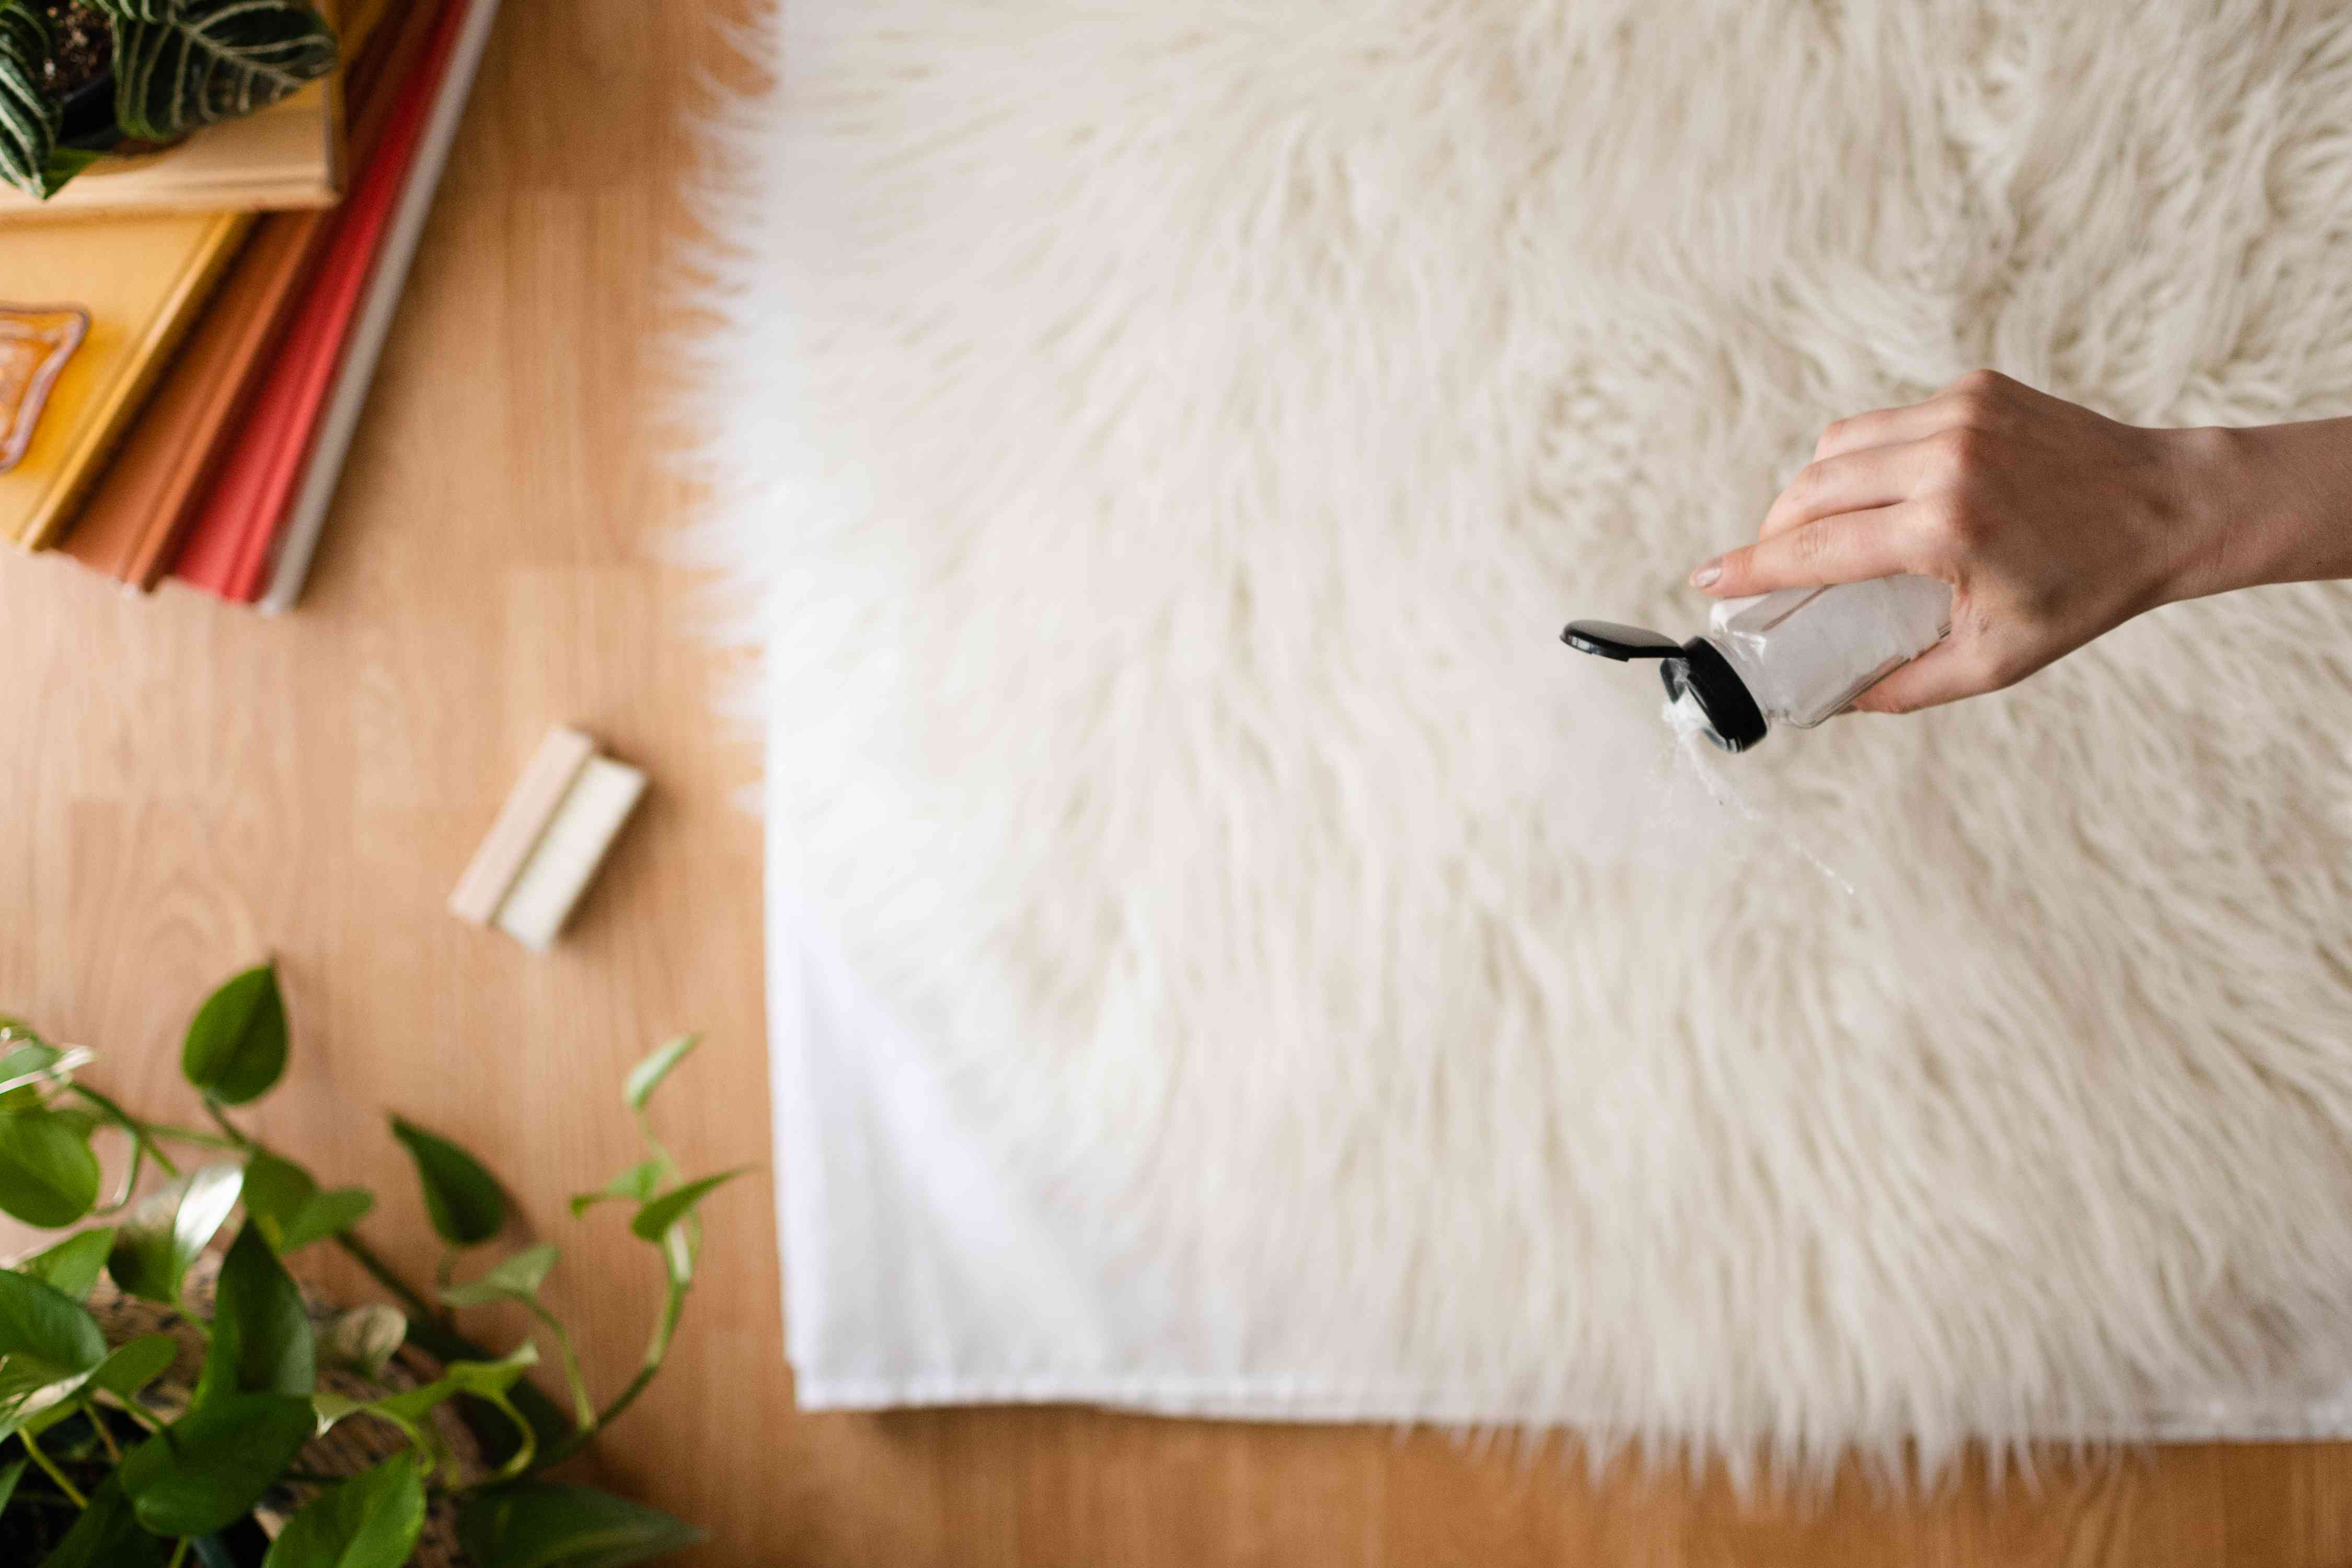 Dry shampoo carpet granules poured on to white shag rug